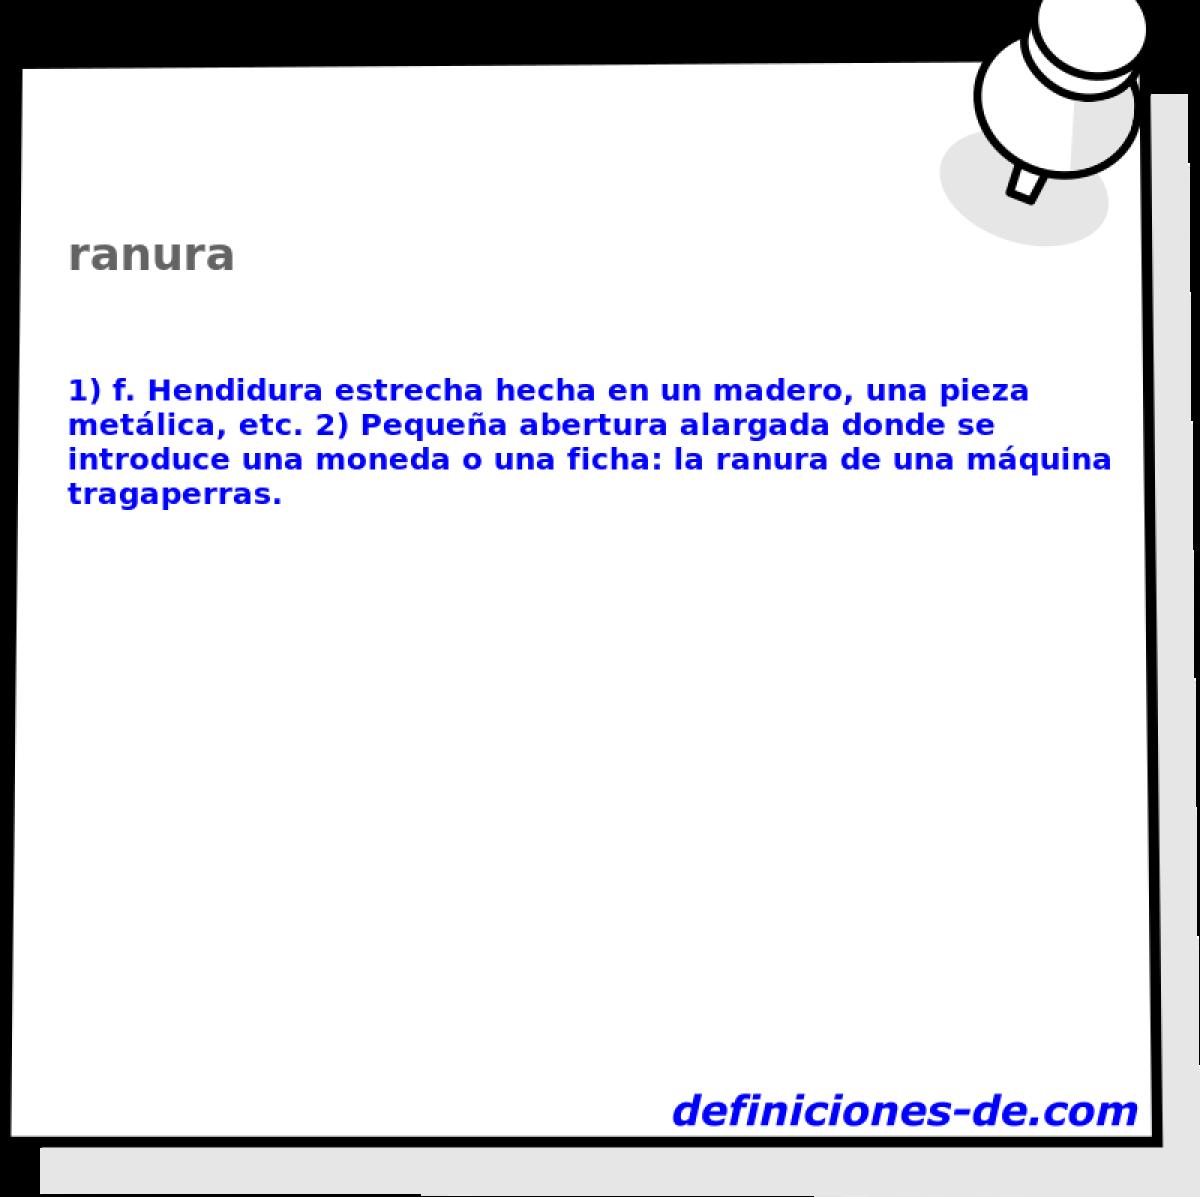 Qué significa Ranura?